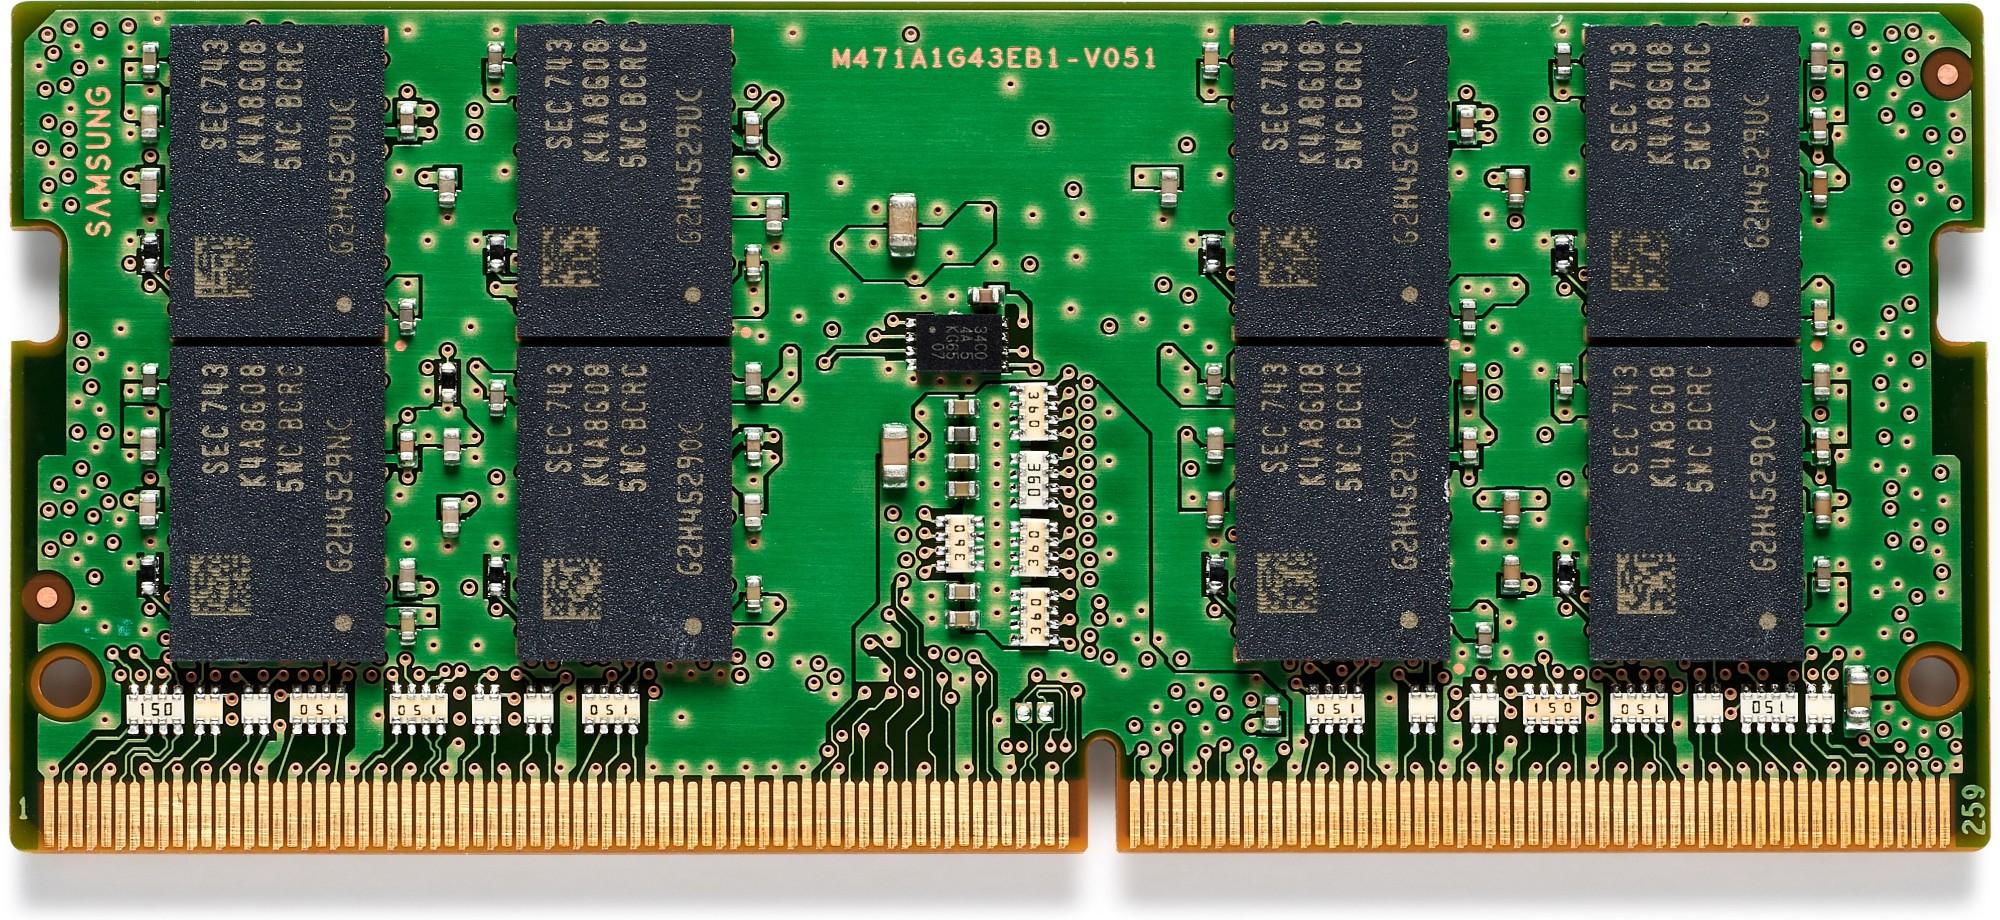 HP 32GB DDR4-3200 SODIMM PROMO memory module